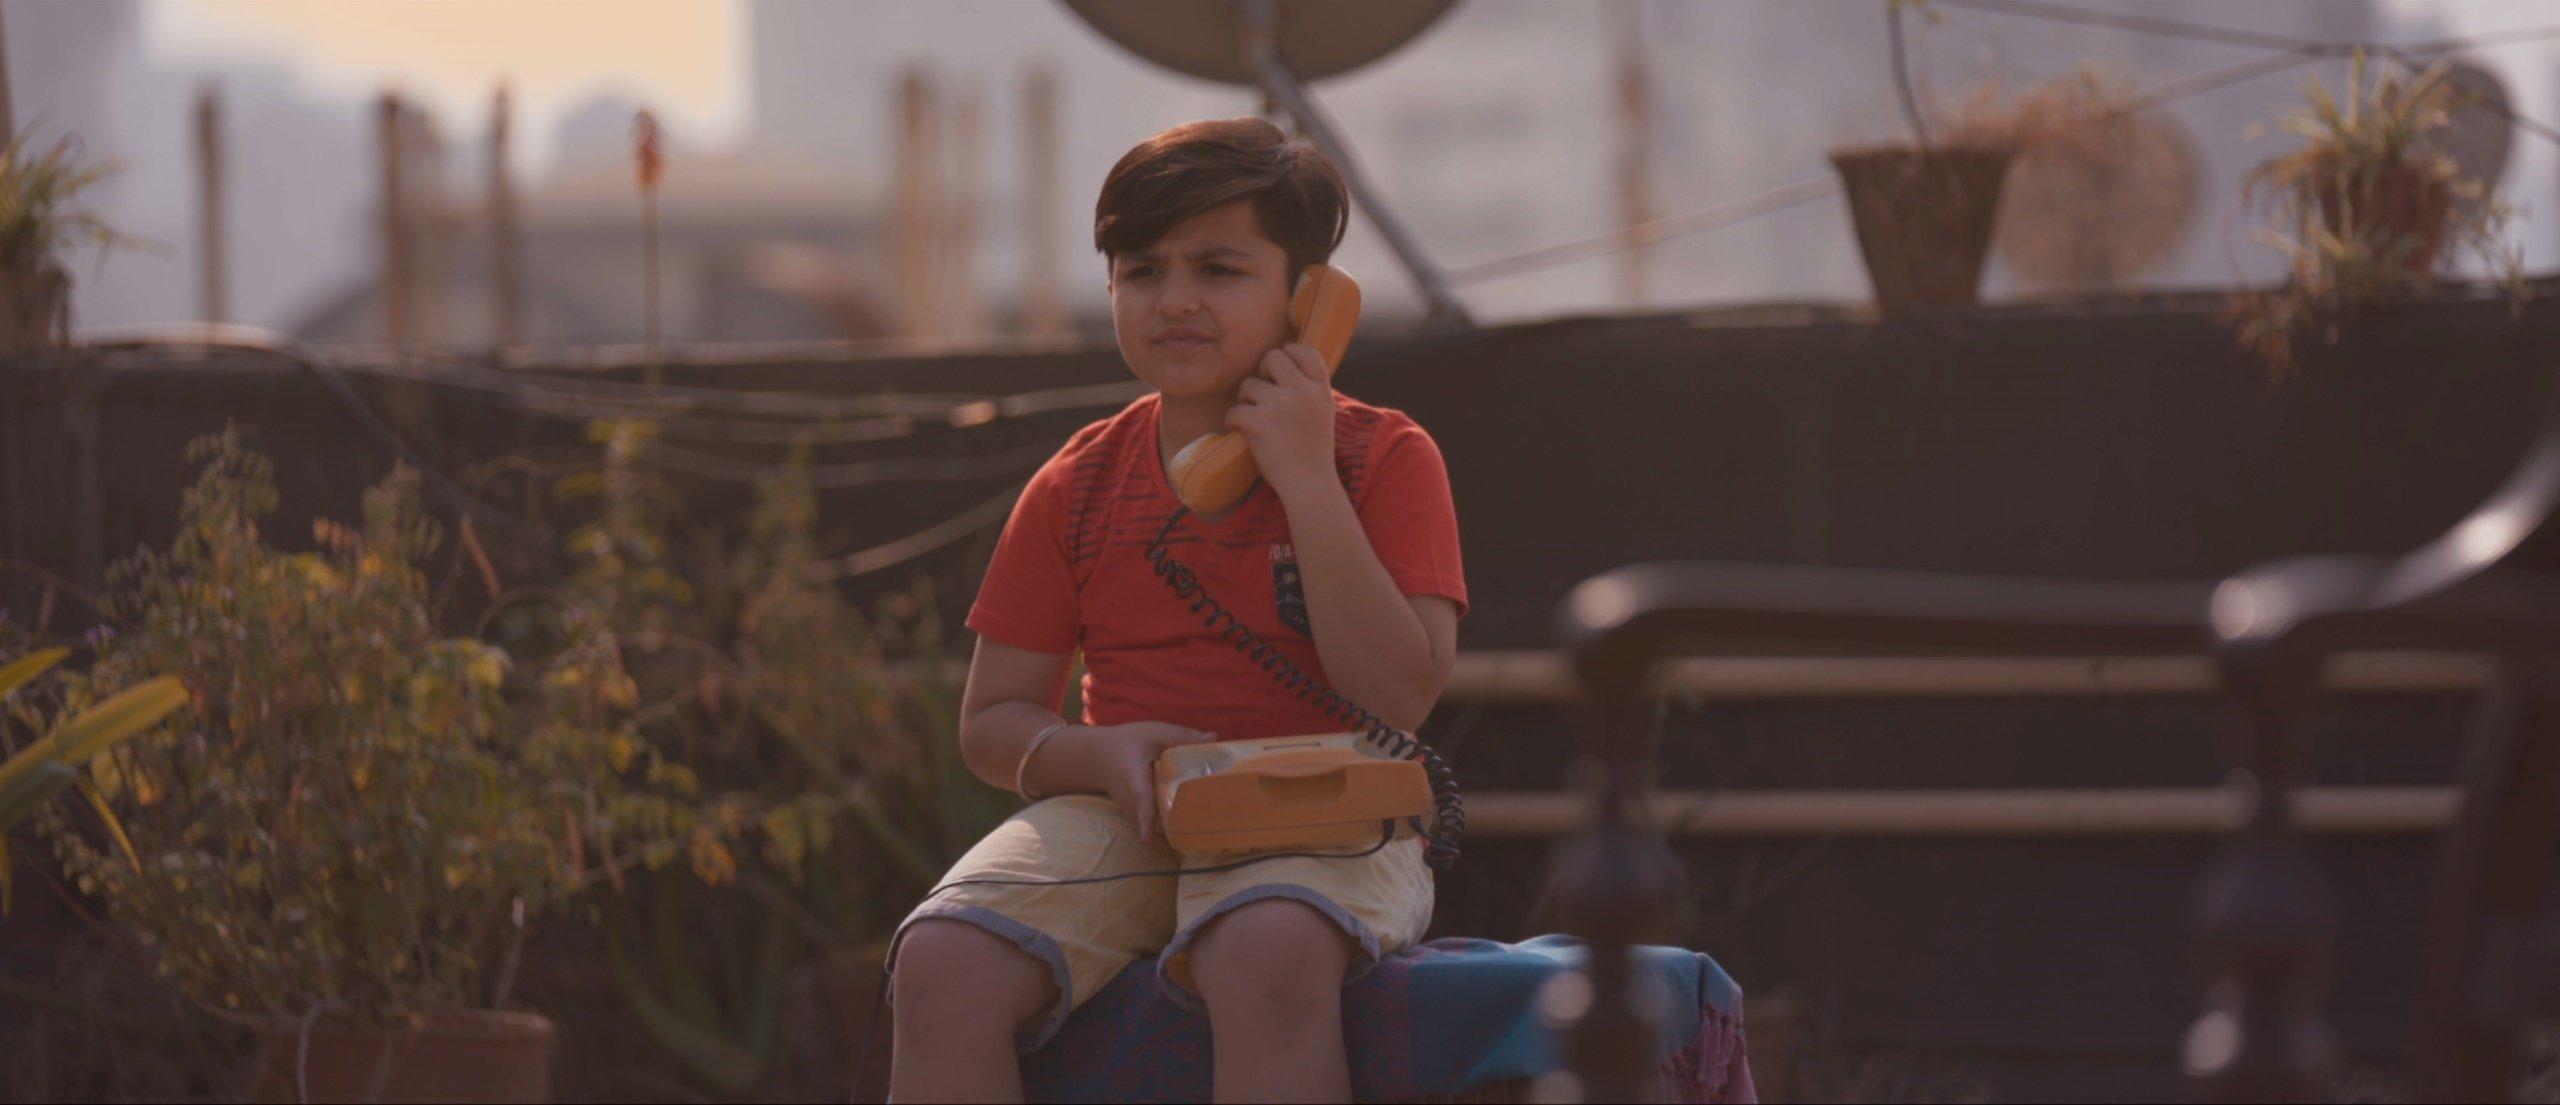 Sarhad Waale Daddy - Dimesnion Mumbai - MAMI 22nd Mumbai Film Festival